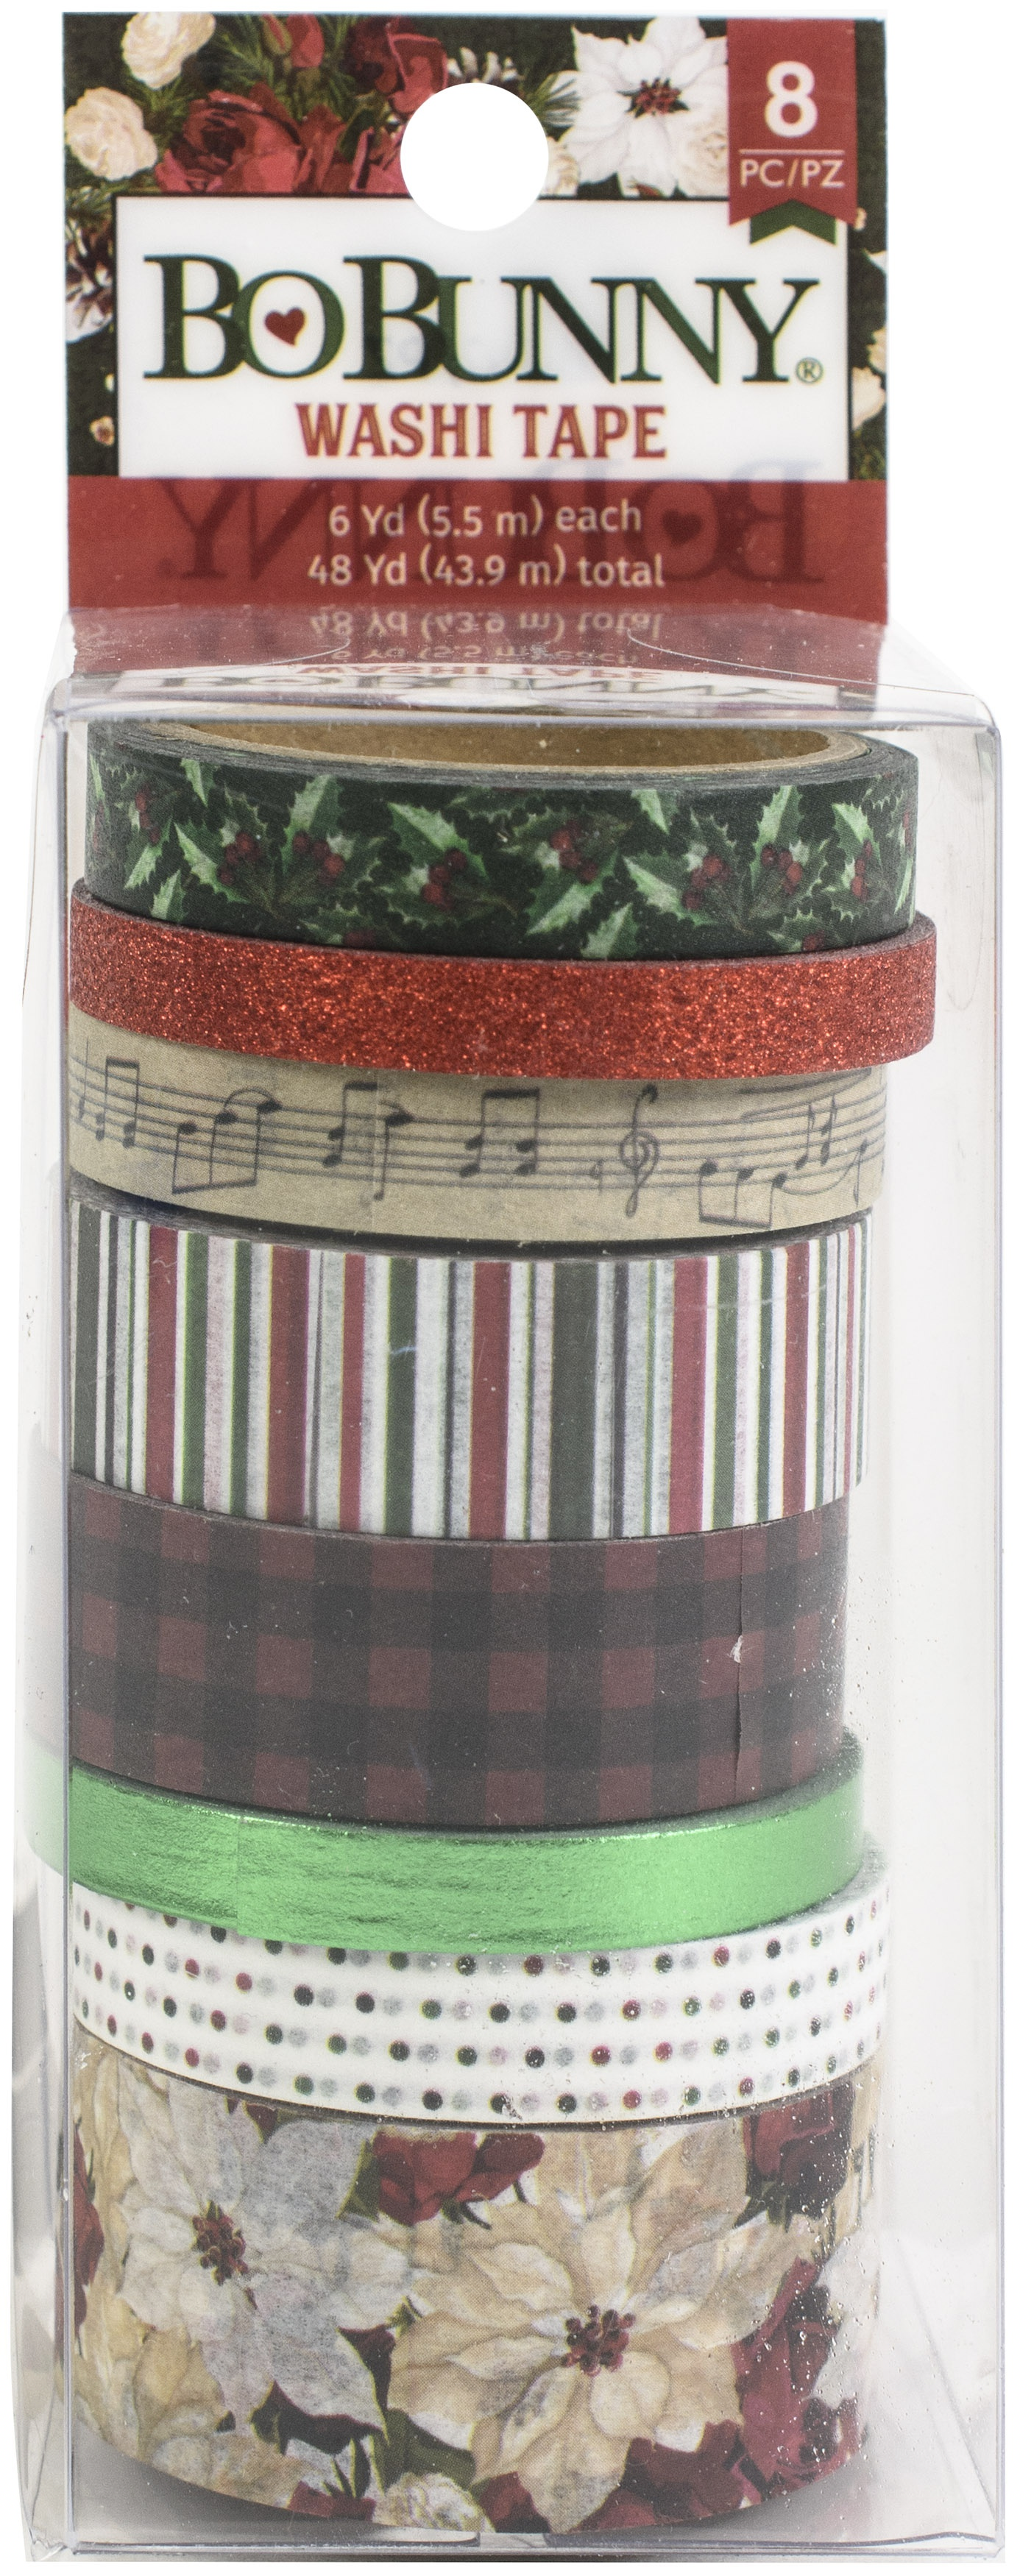 BoBunny Washi Tape 8/Pkg-Joyful Christmas